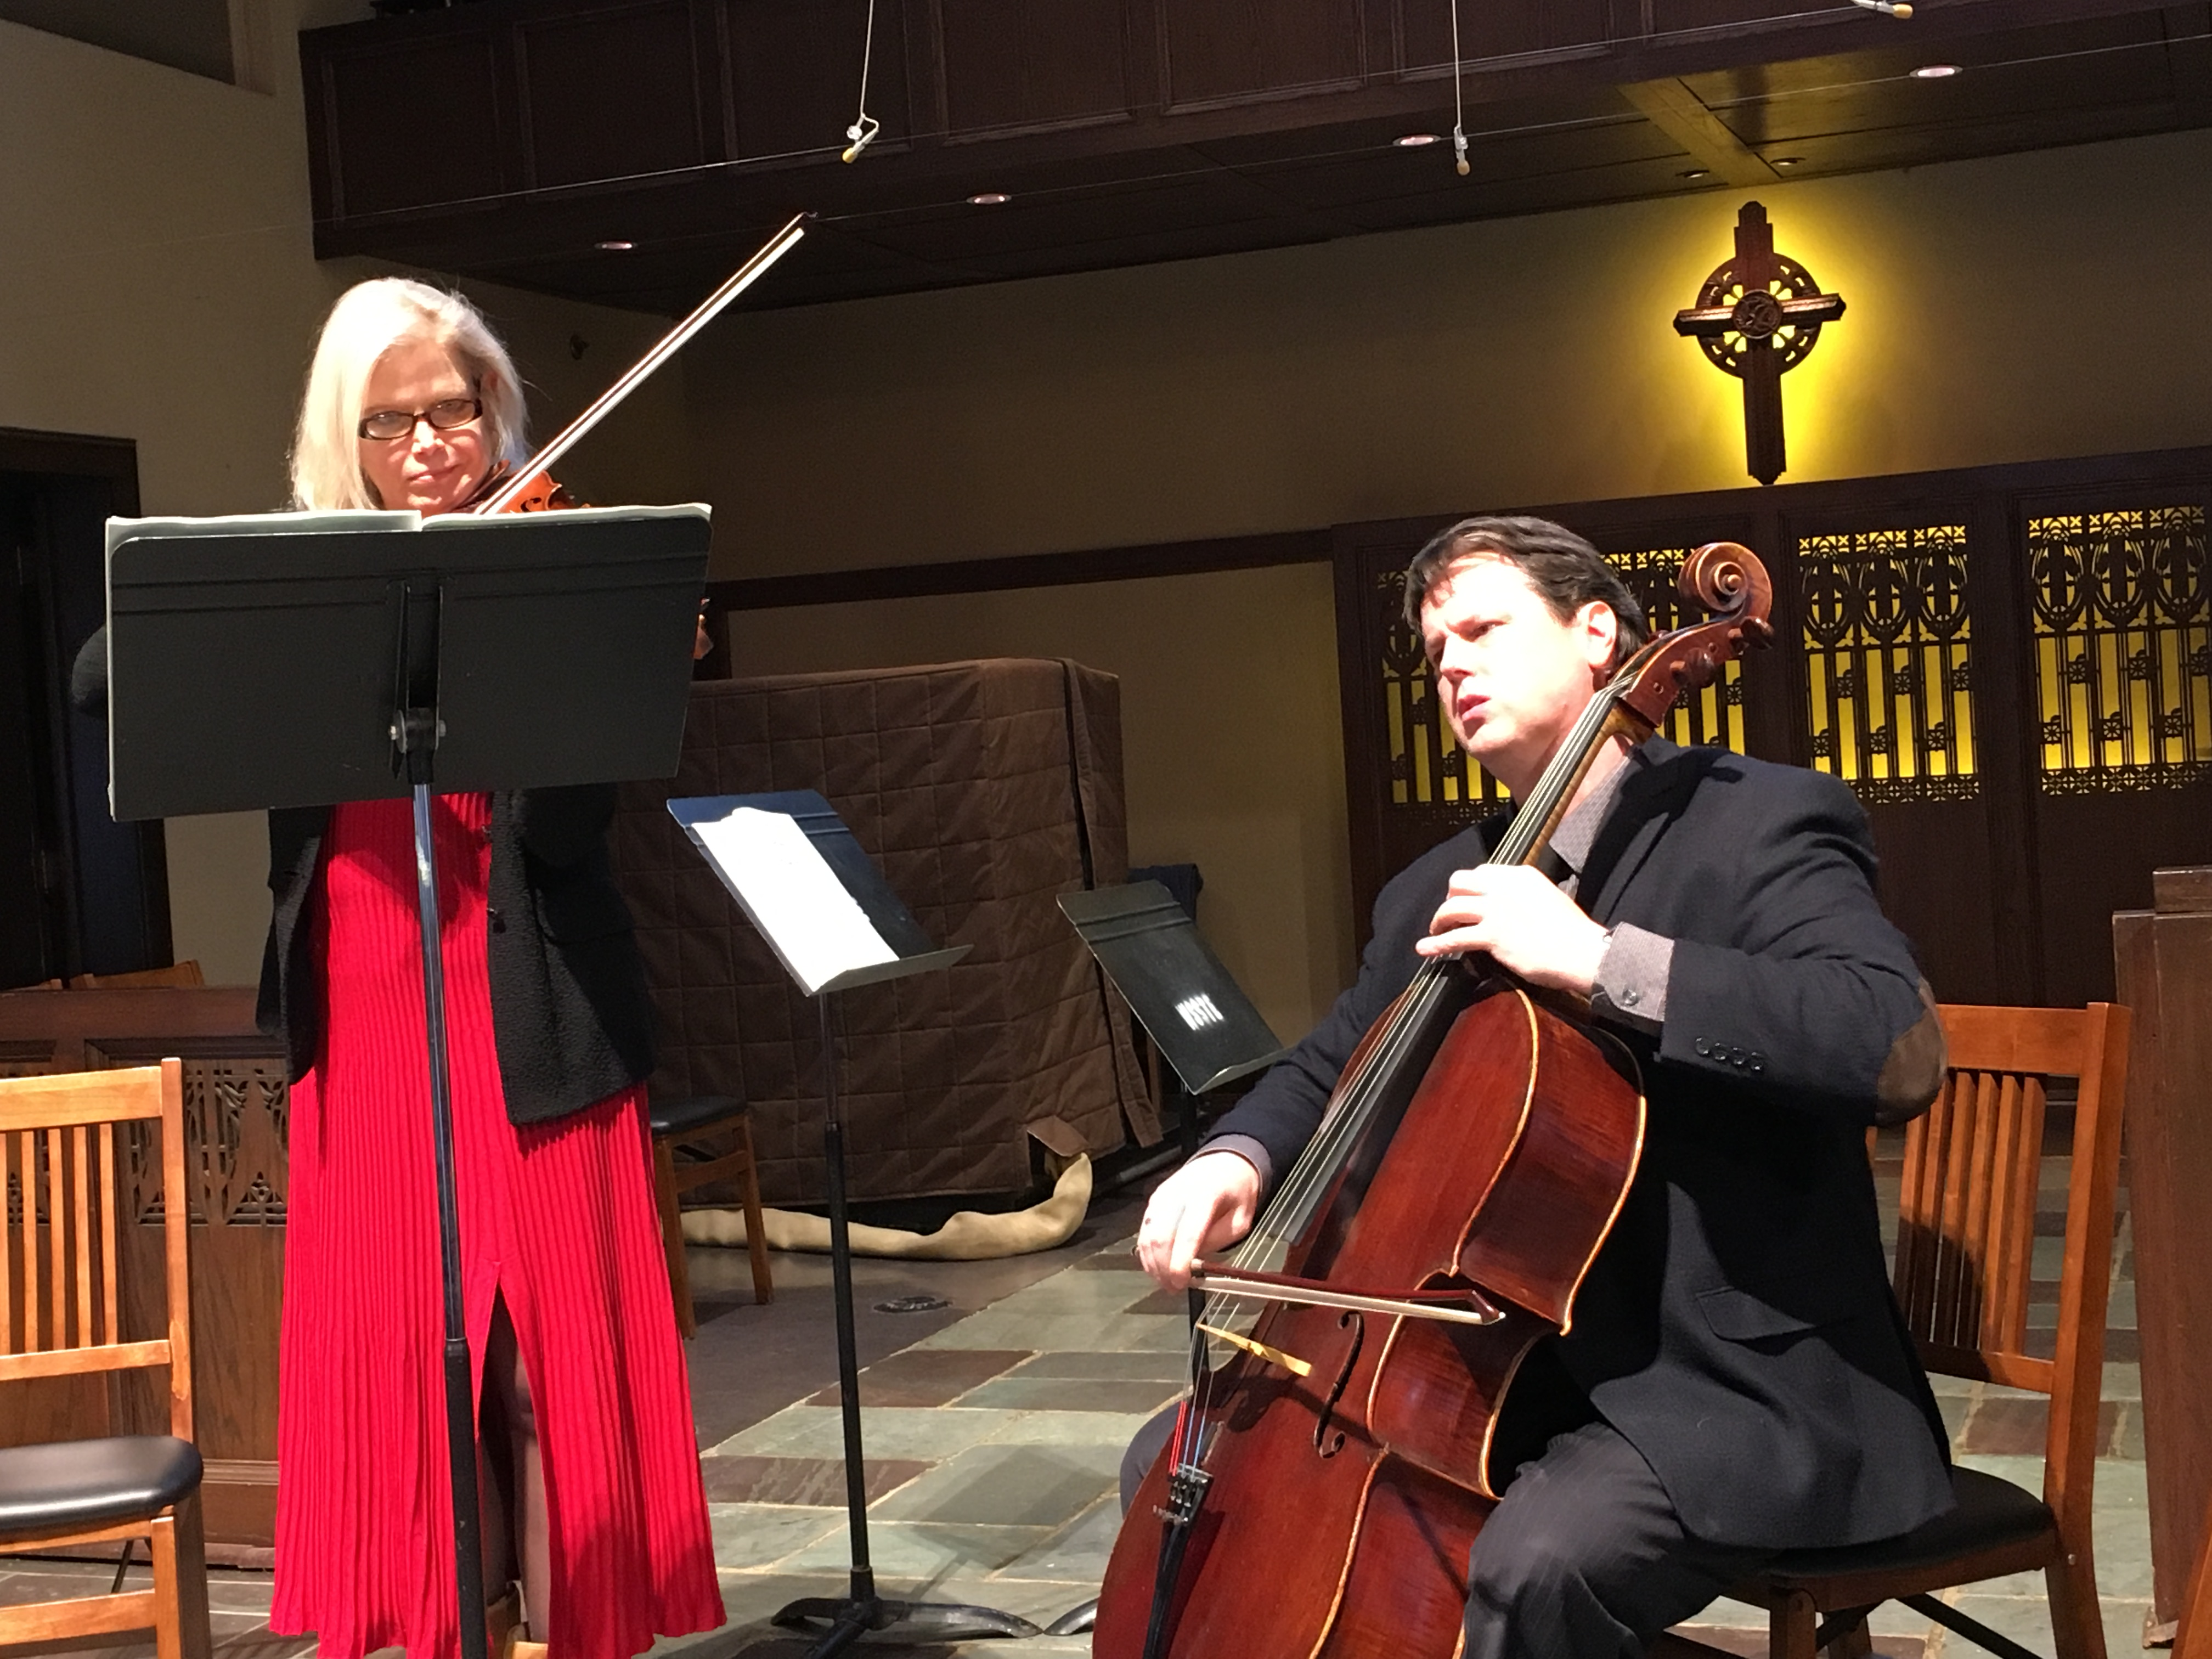 Linda Veleckis Nussbaum + Steven Sigurdson 3